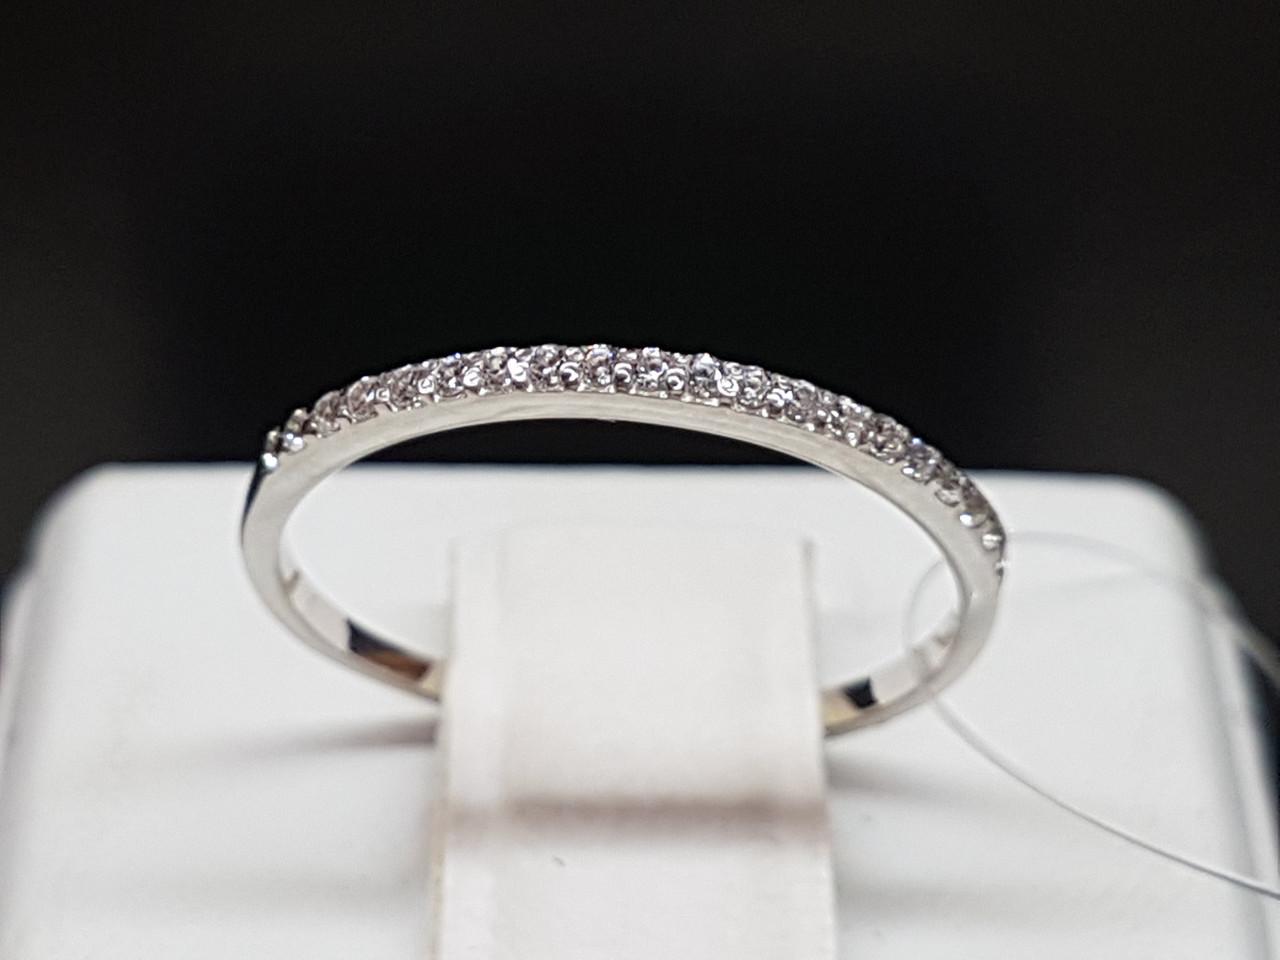 Серебряное кольцо с фианитами. Артикул 901-00726 15